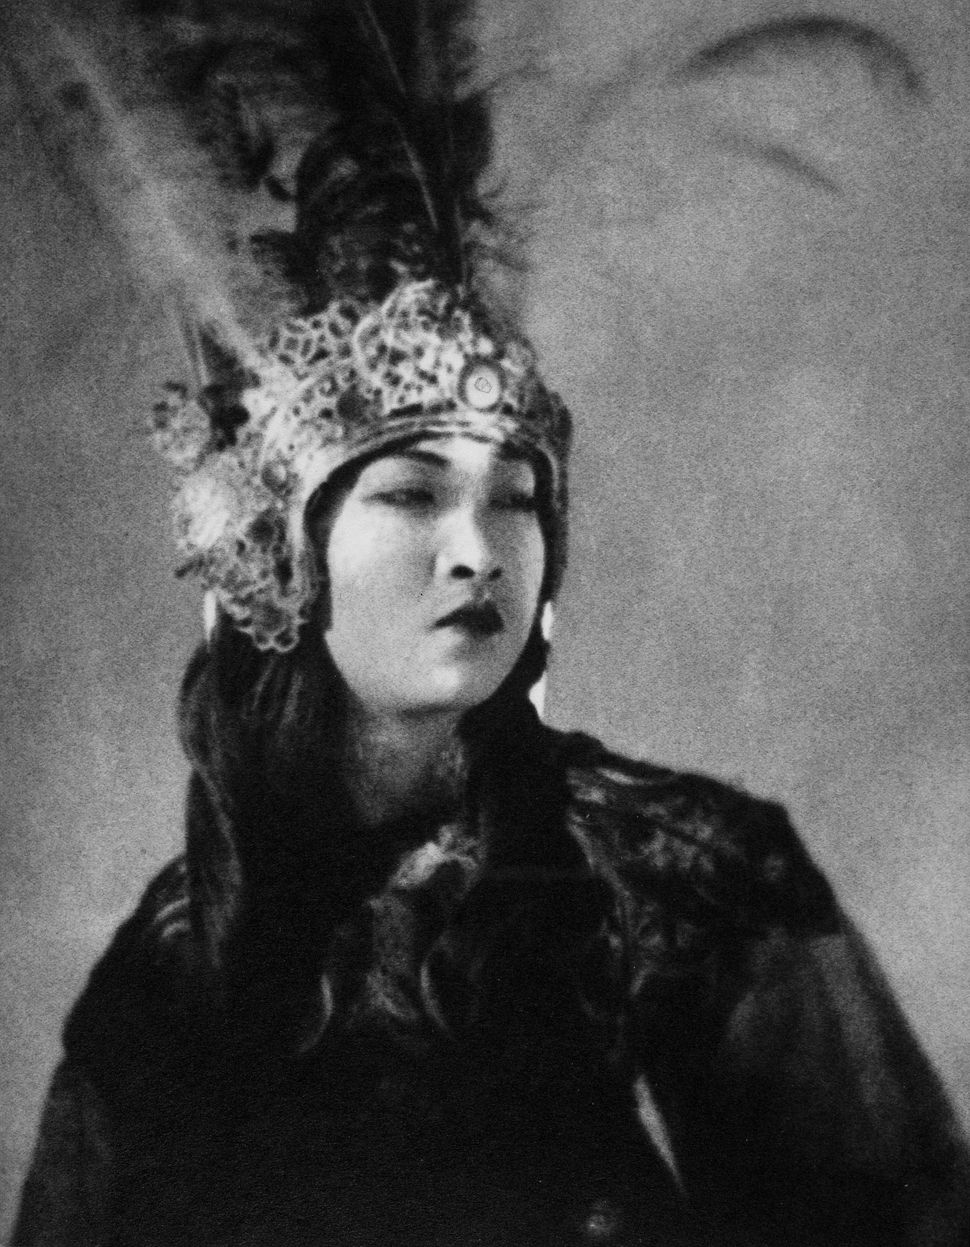 Portrait of Anna Mae Wong